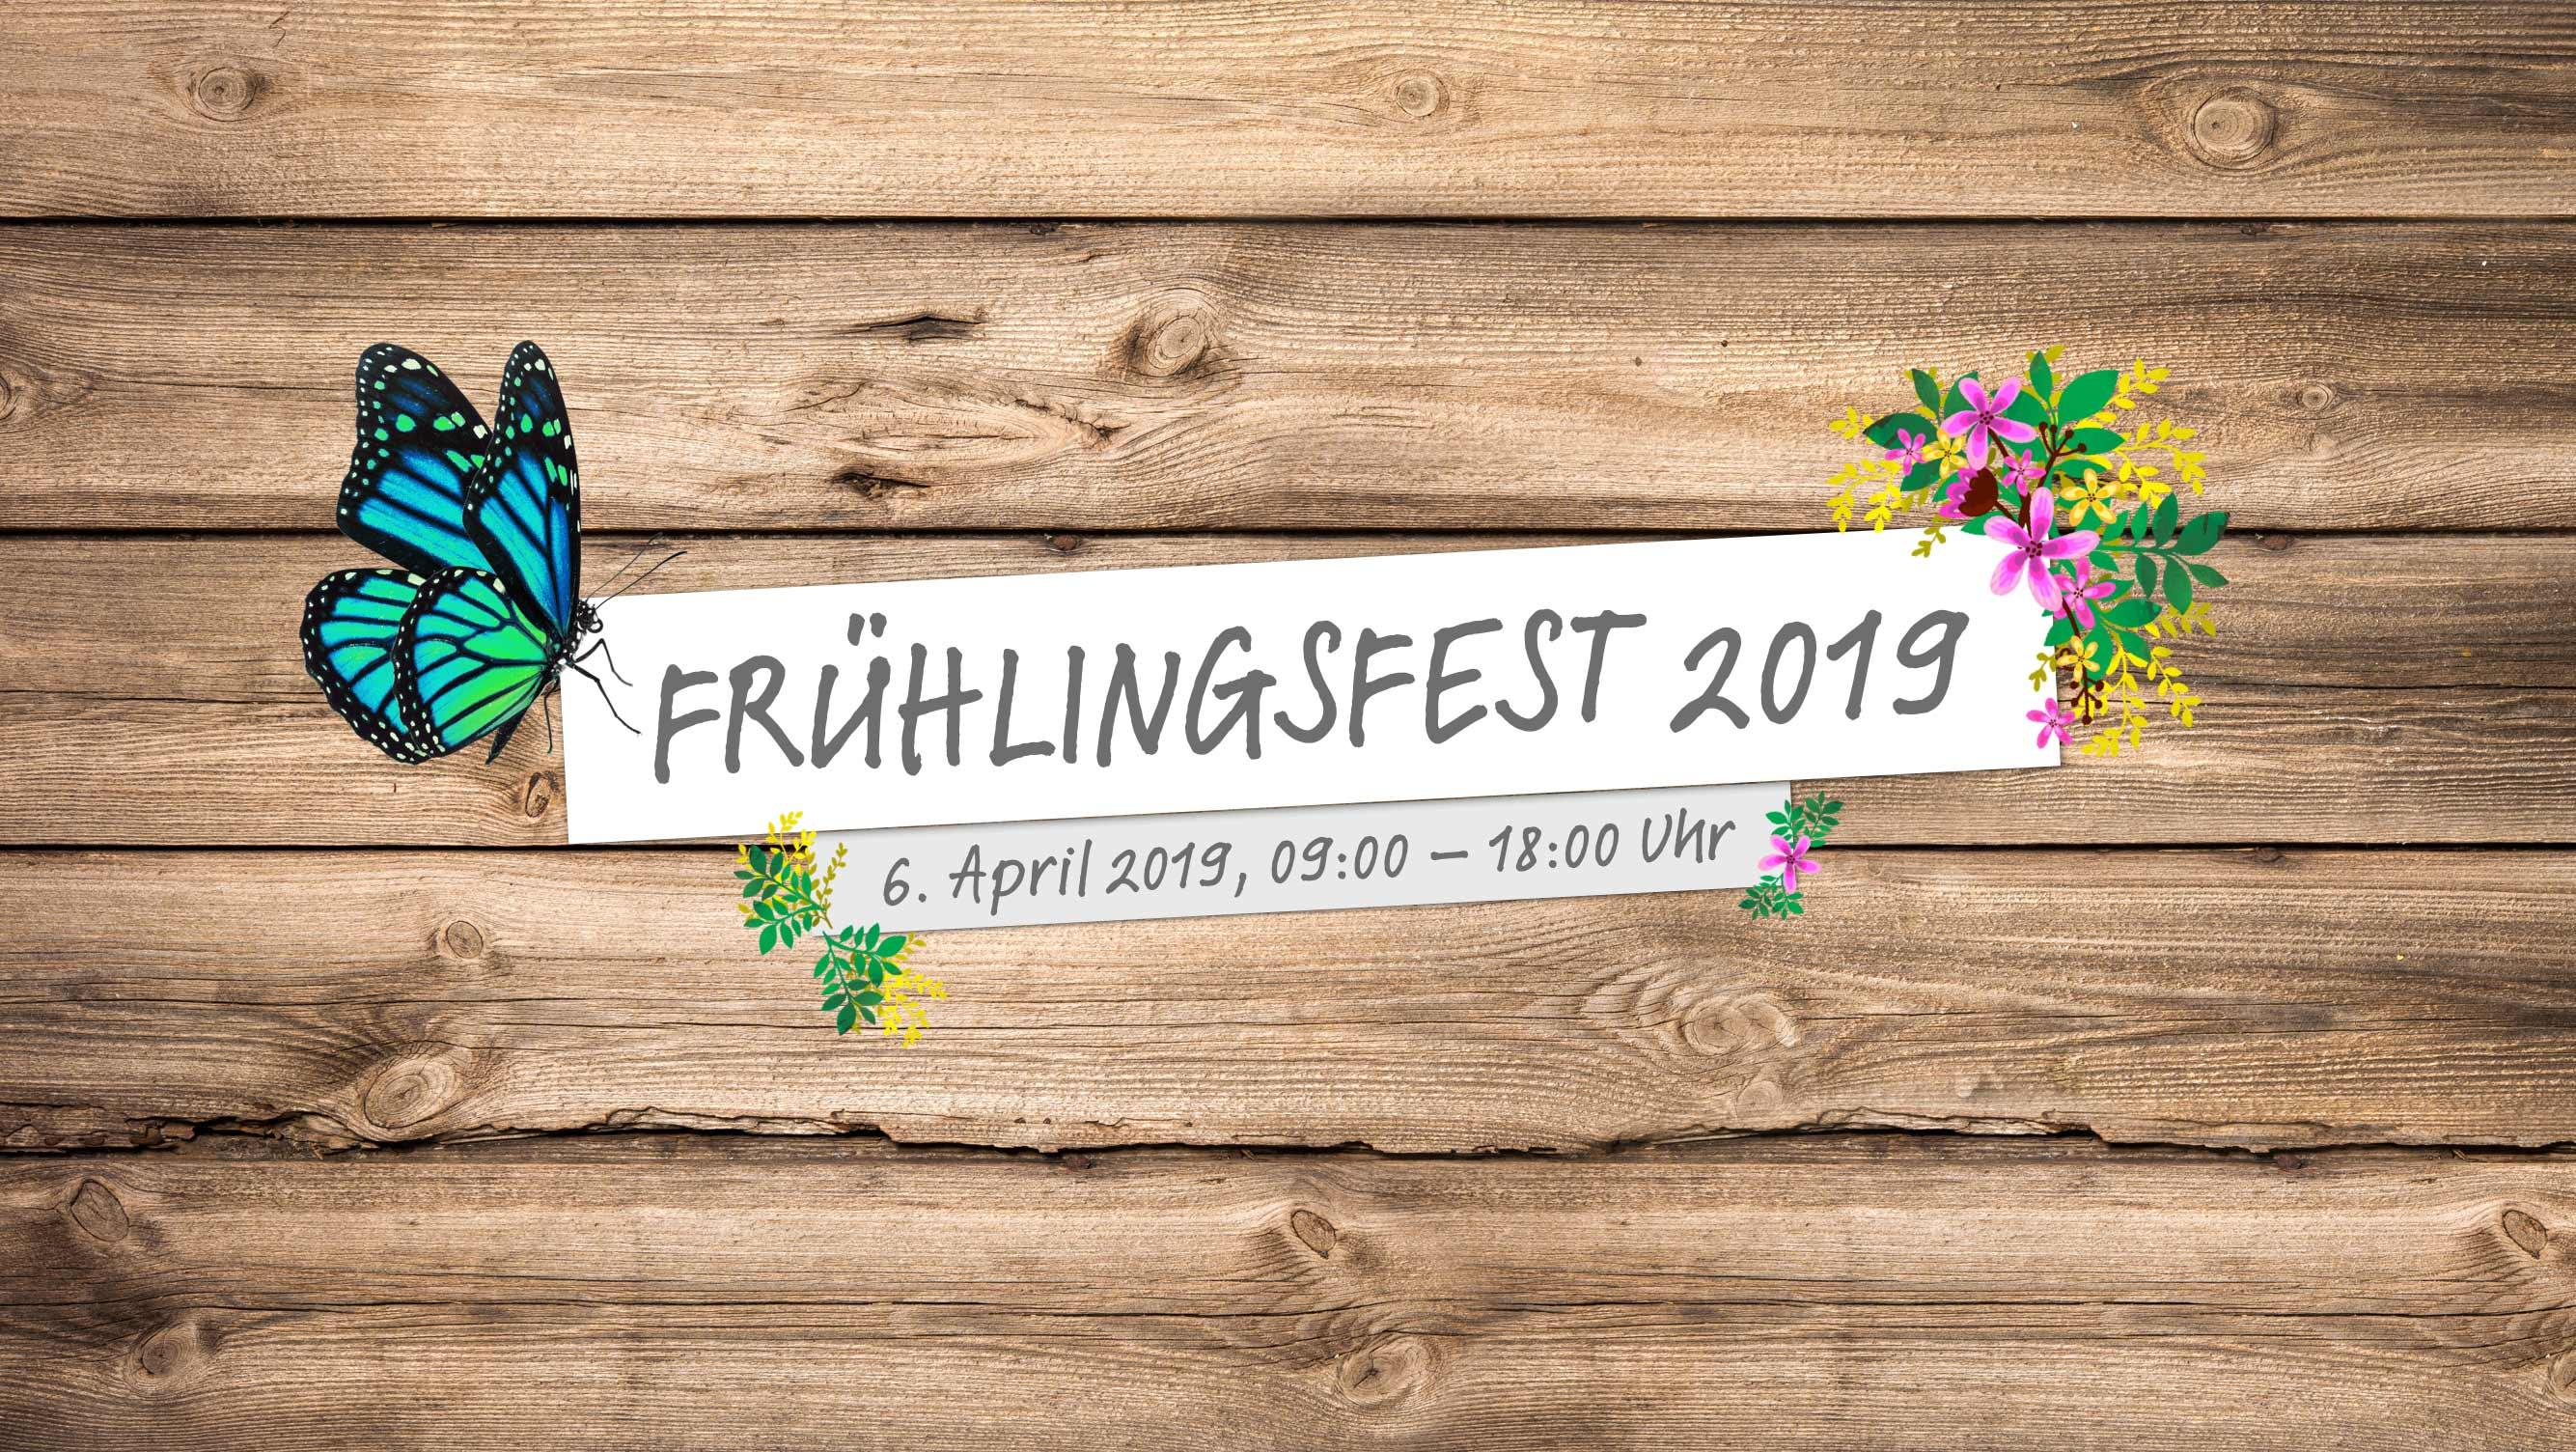 Frühlingsfest am 6. April 2019 bei HolzLand Beese in Unna